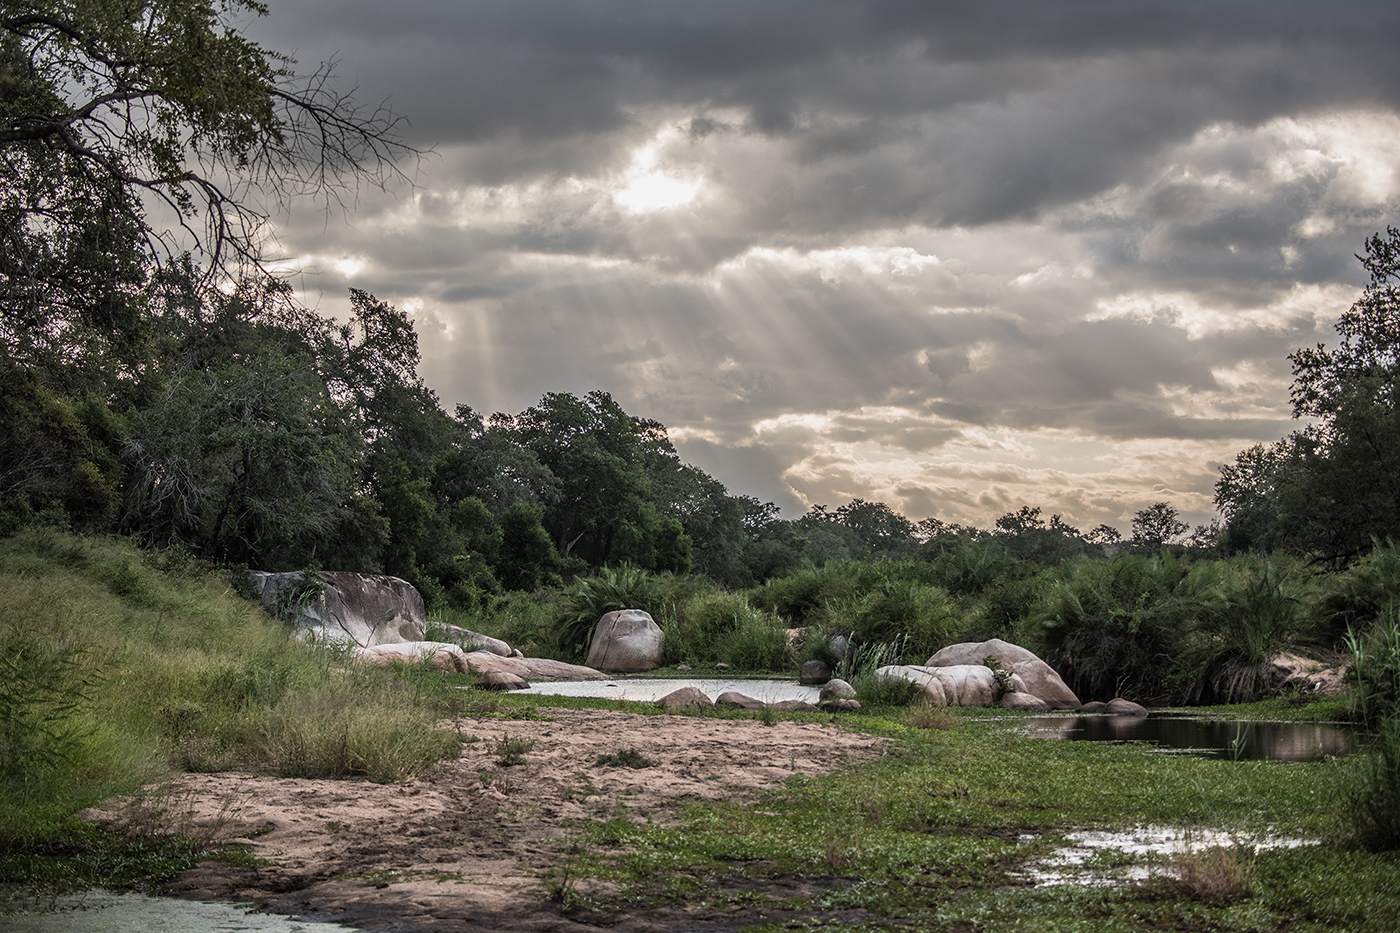 manyaleti, dusk, clouds, AR